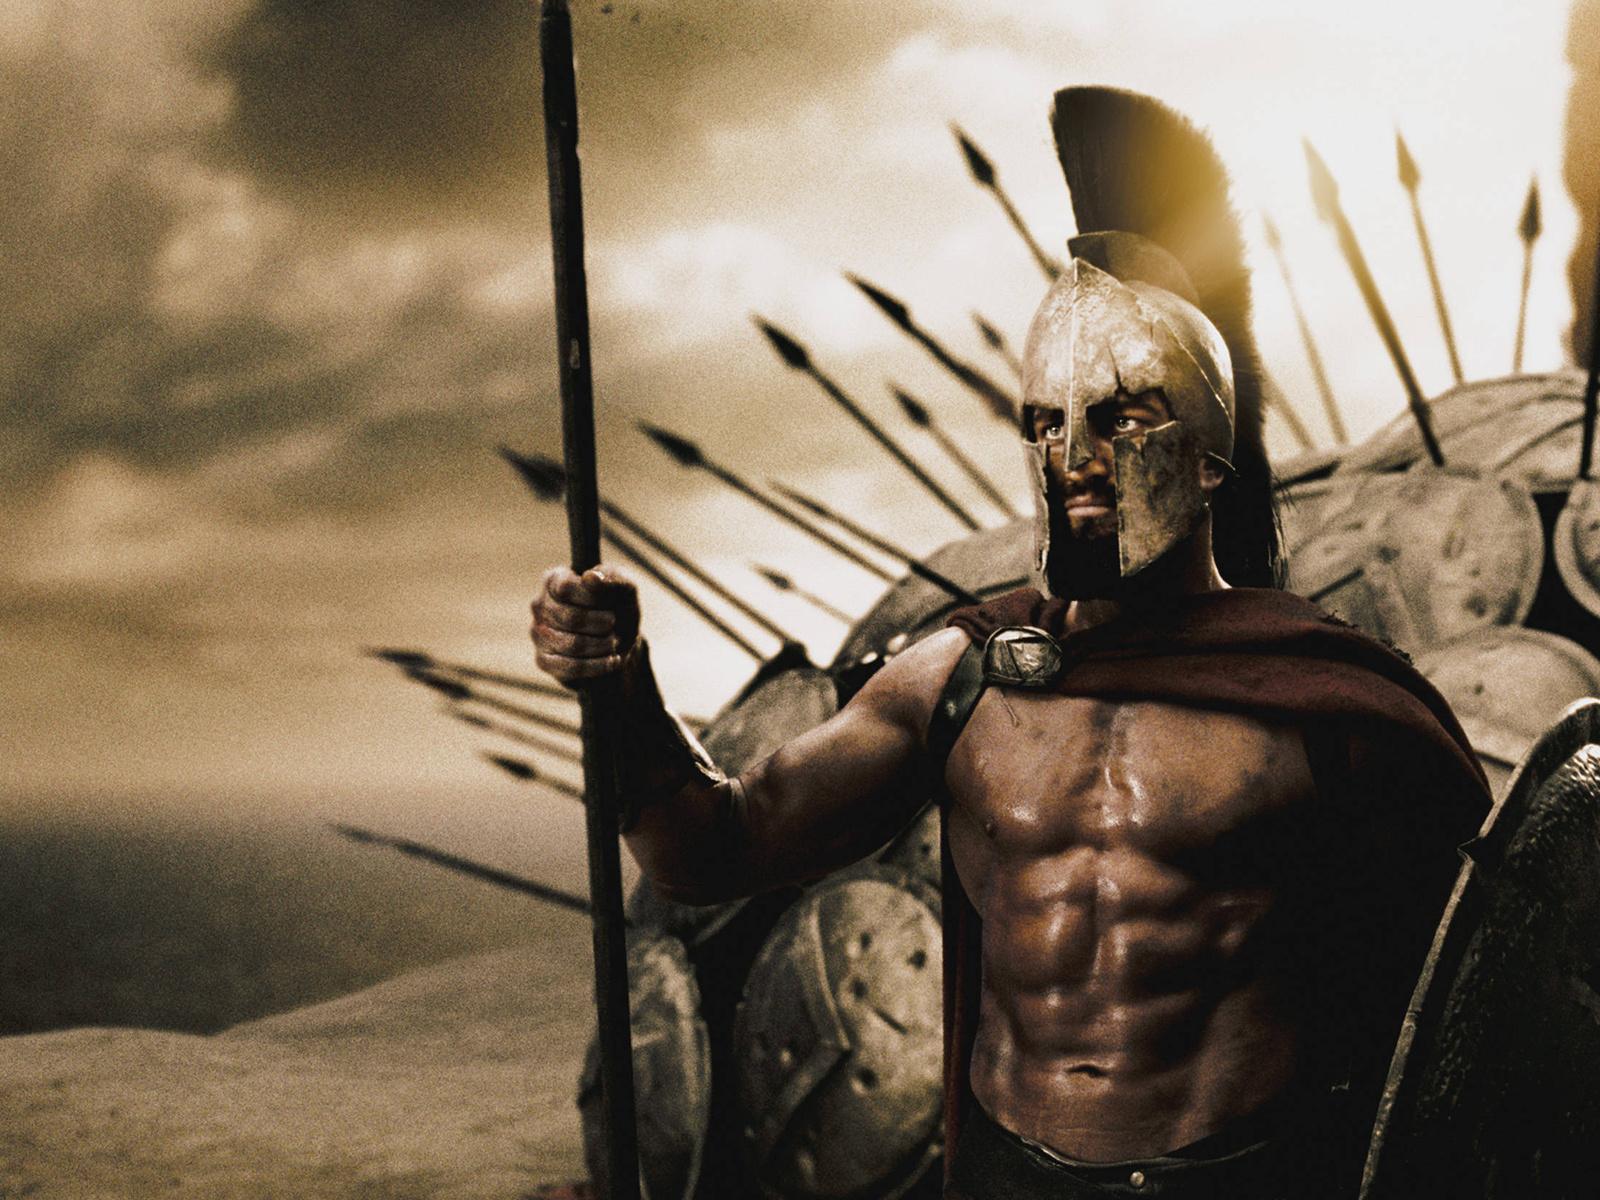 300 спартанцев, фото, обои для рабочего стола, knight wallpaper